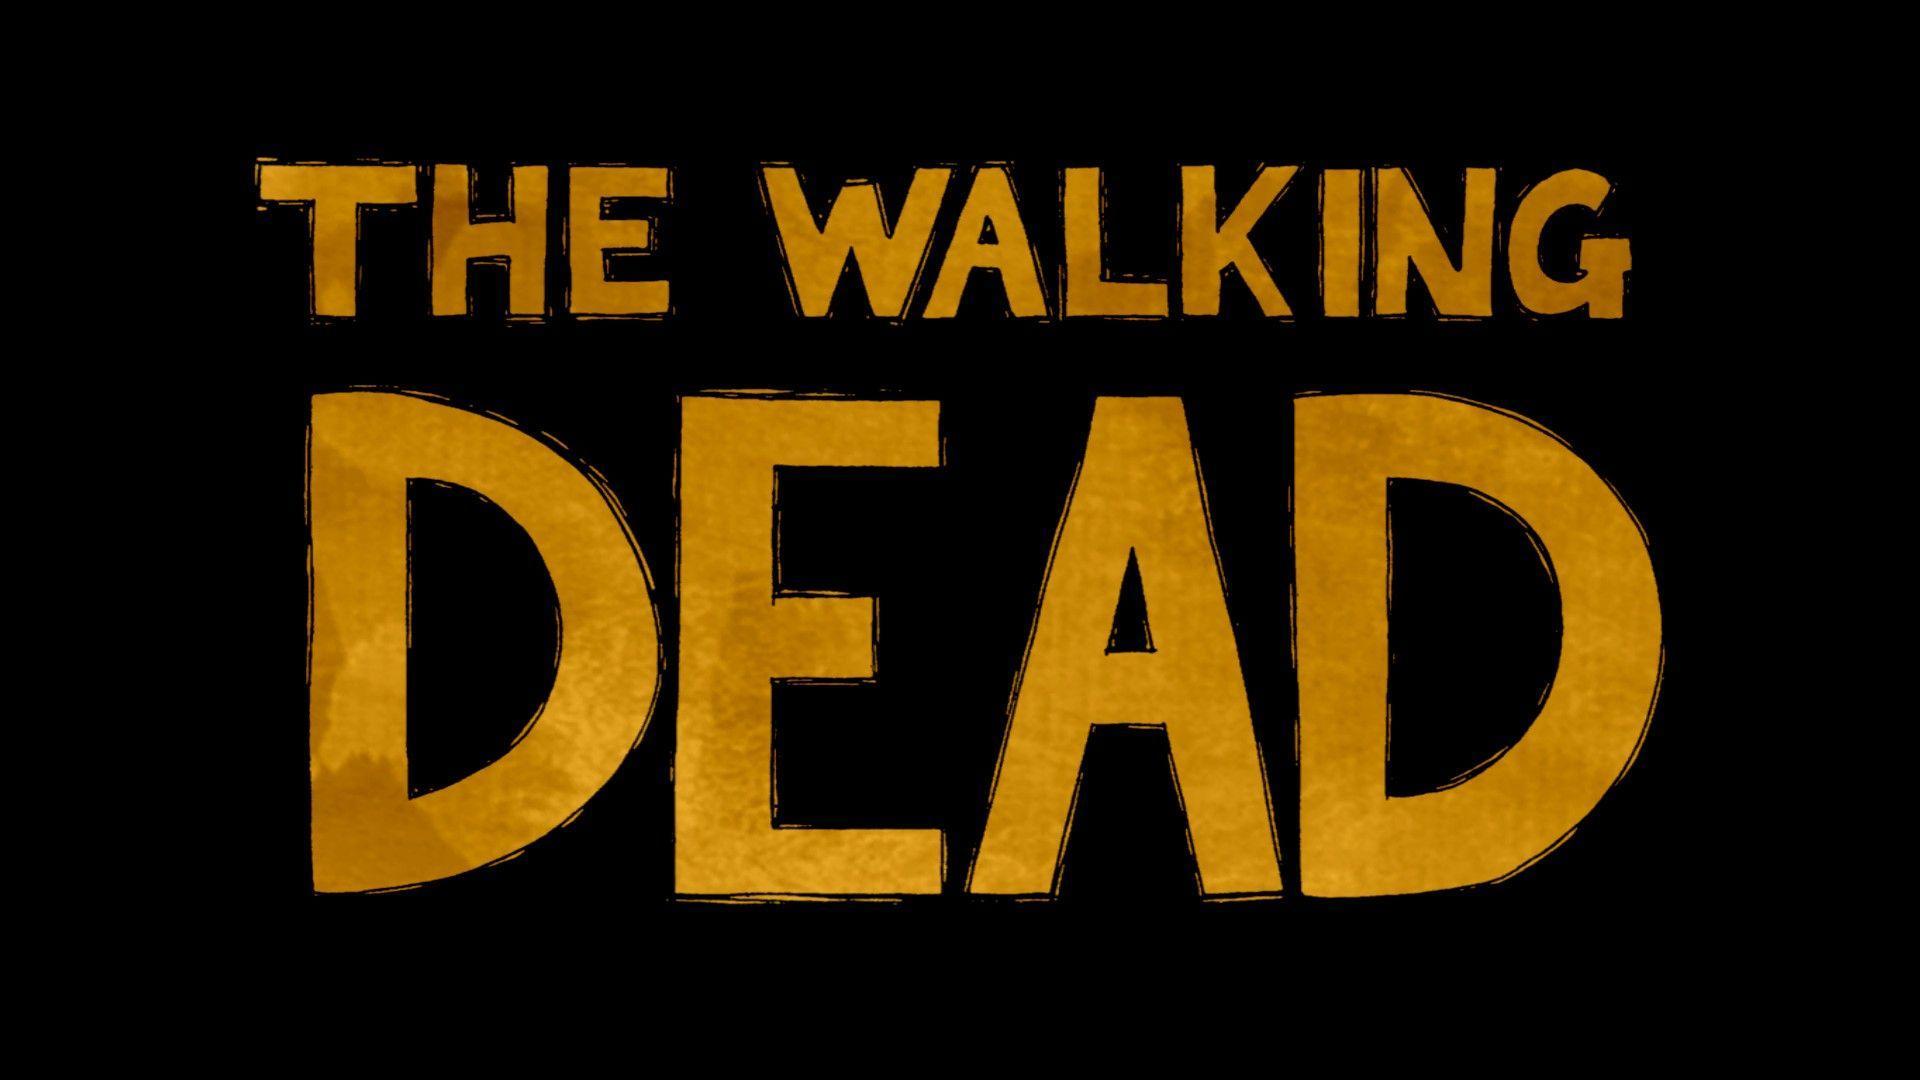 Walking Dead Comic Iphone Wallpaper For Kids